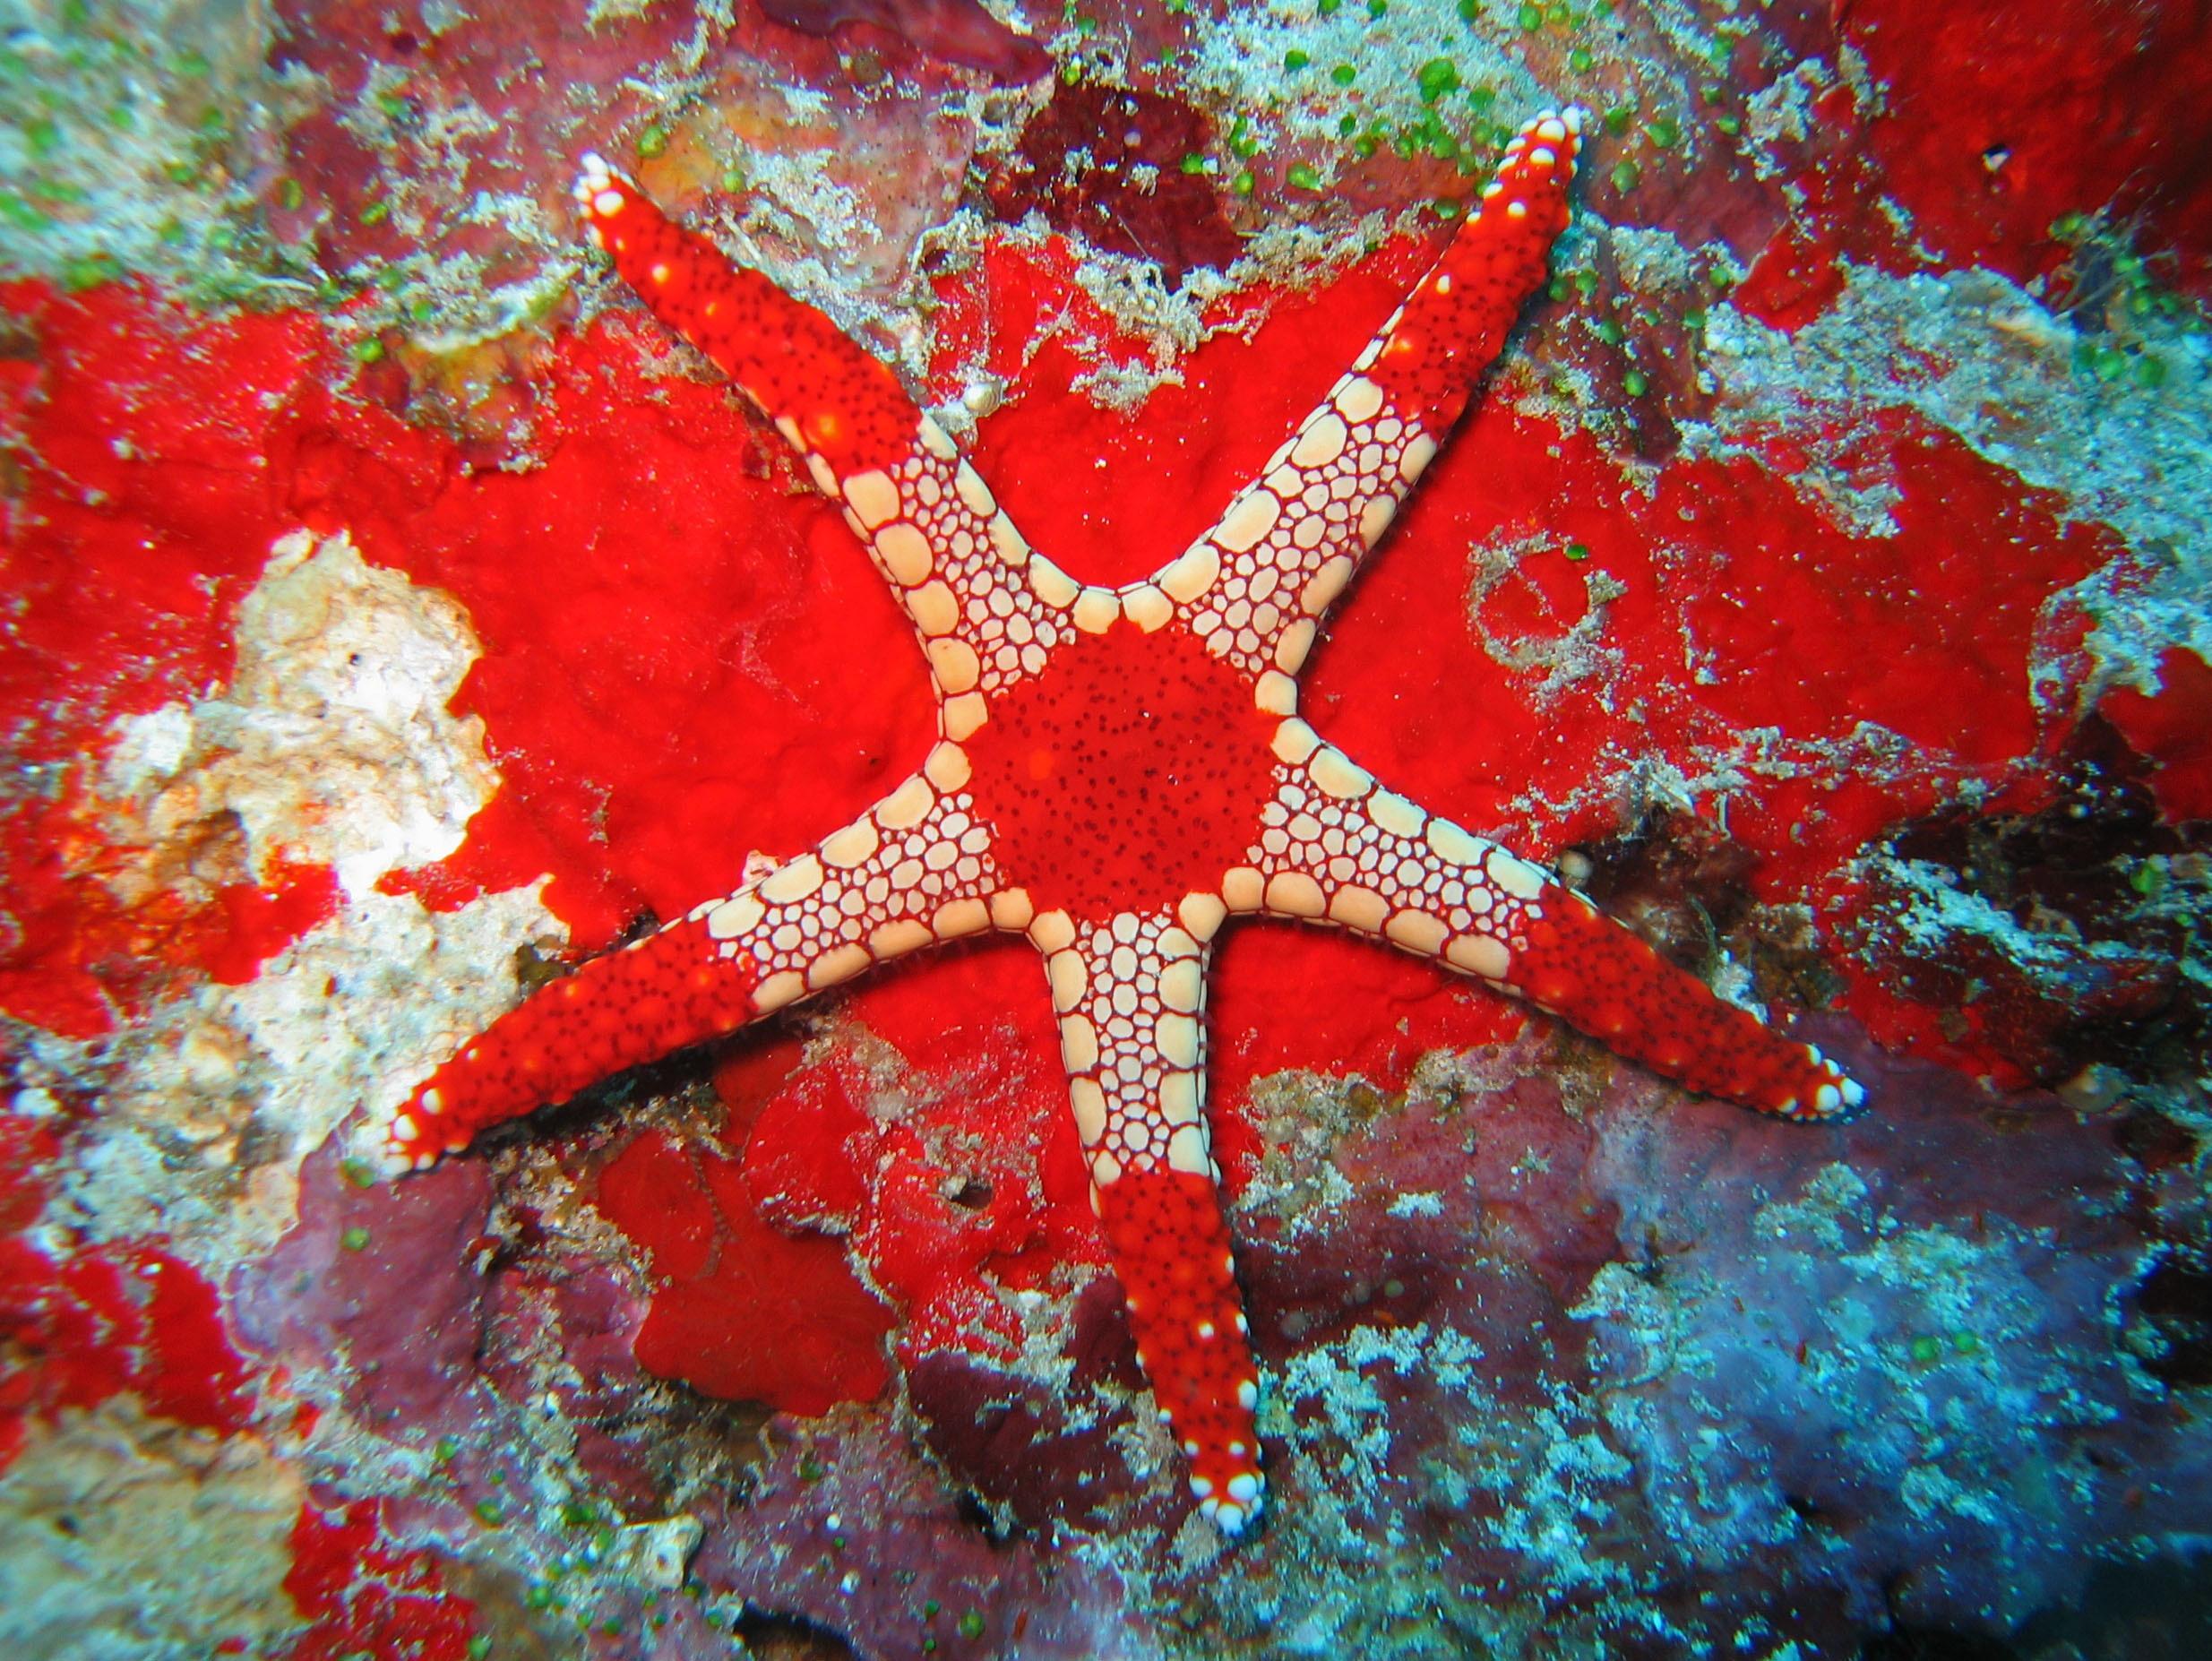 Borneo – starfish